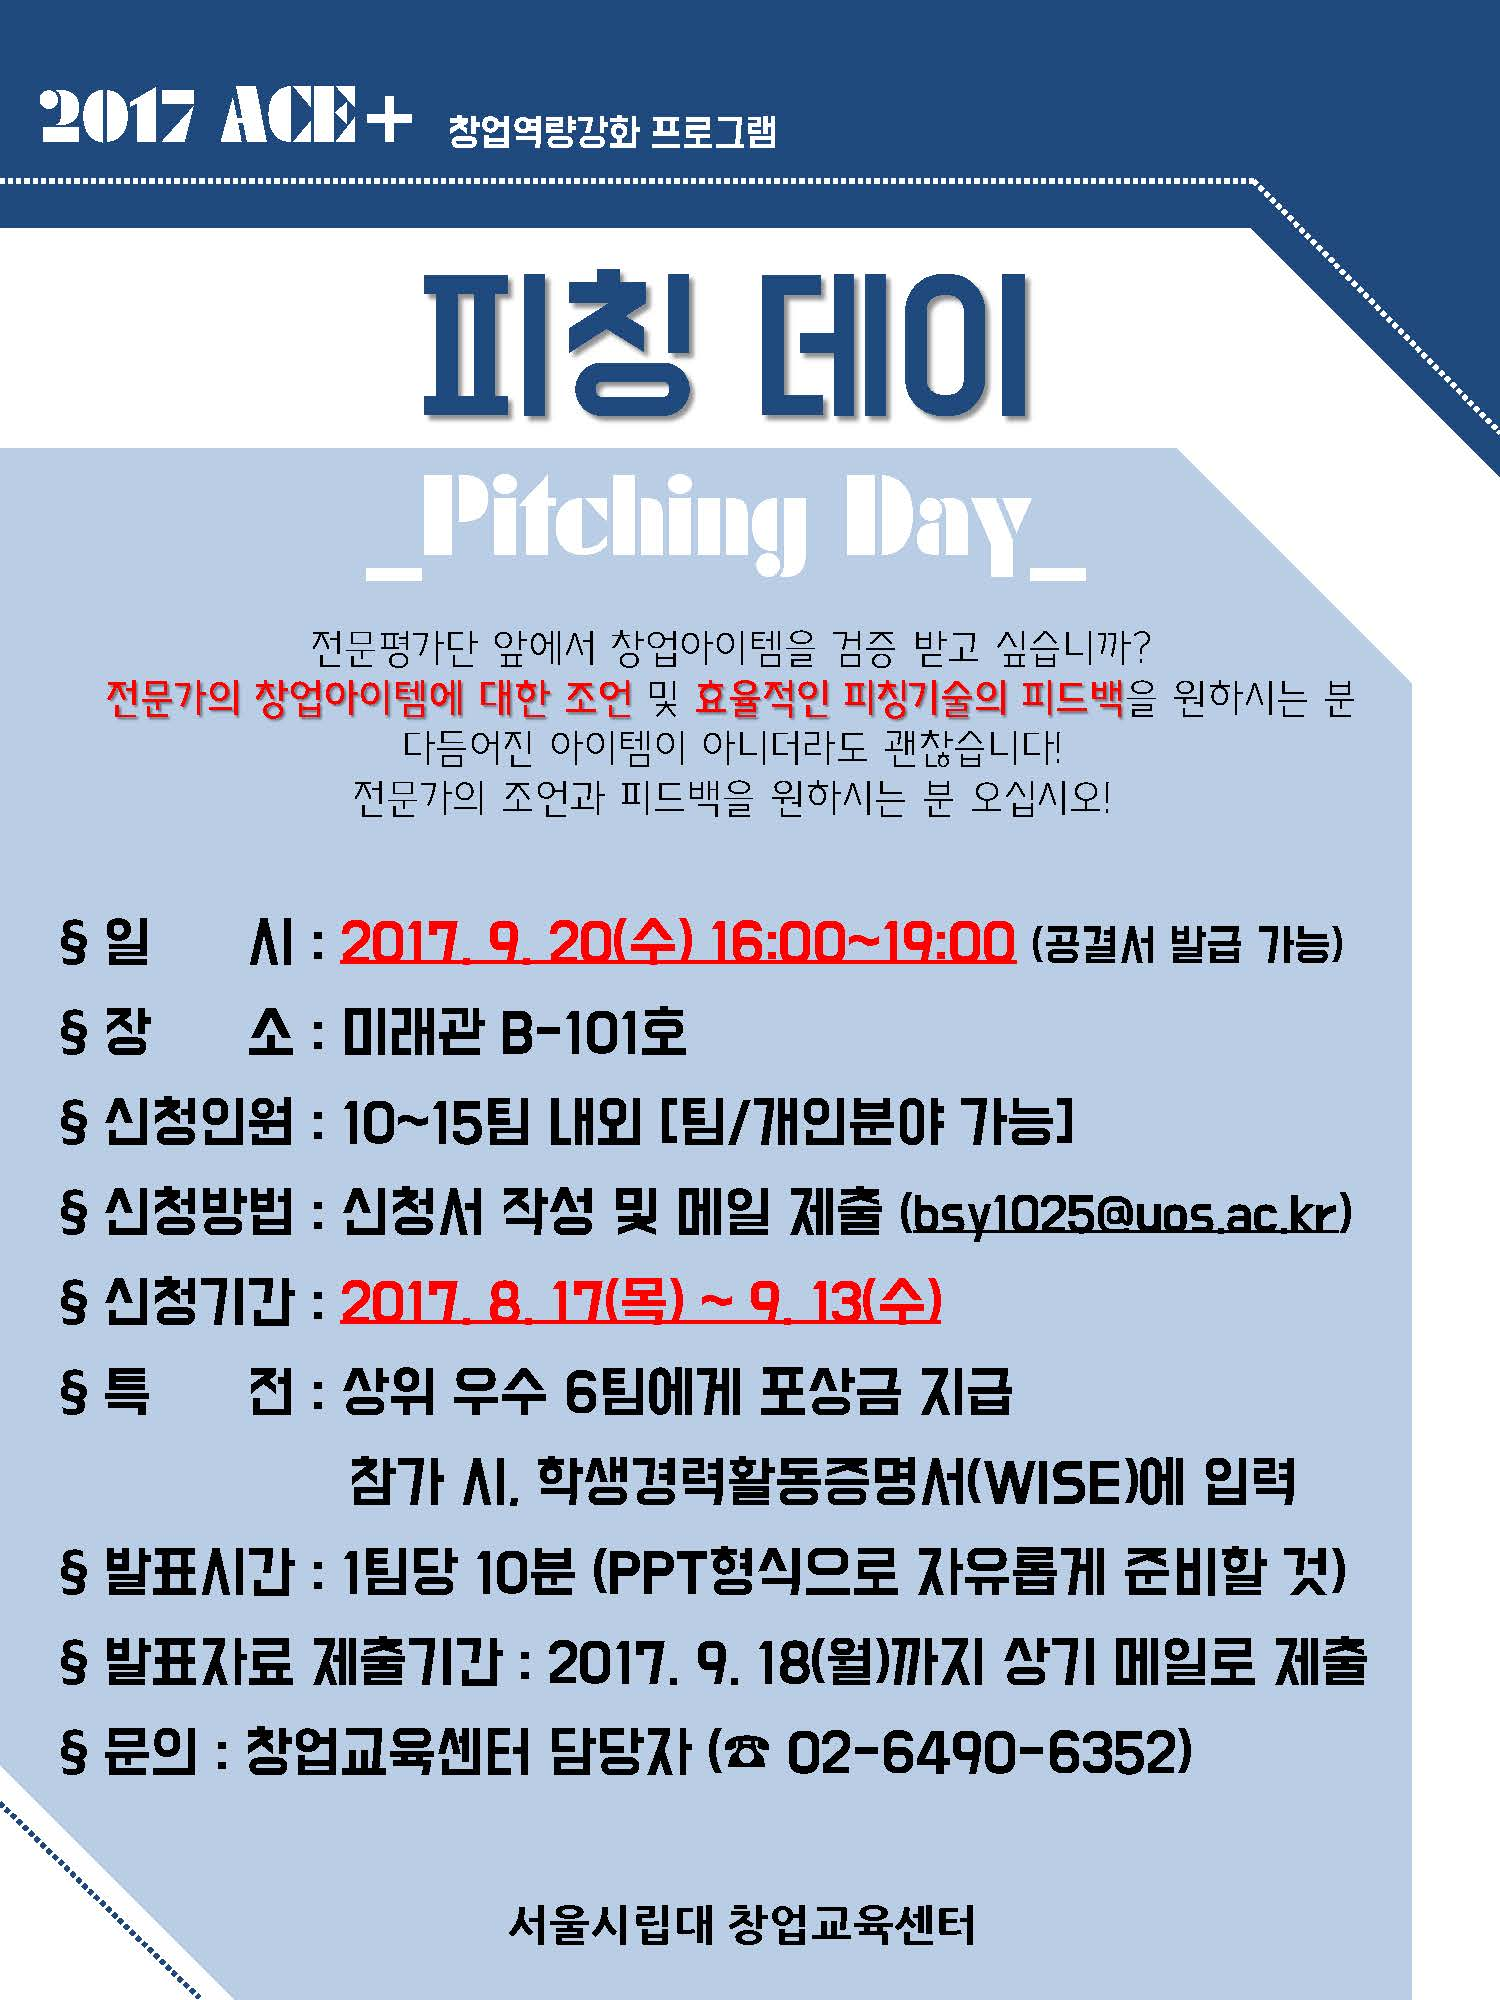 2017 ACE+ 창업역량강화 프로그램 '피칭데이(Pitching Day)' 참가자 모집